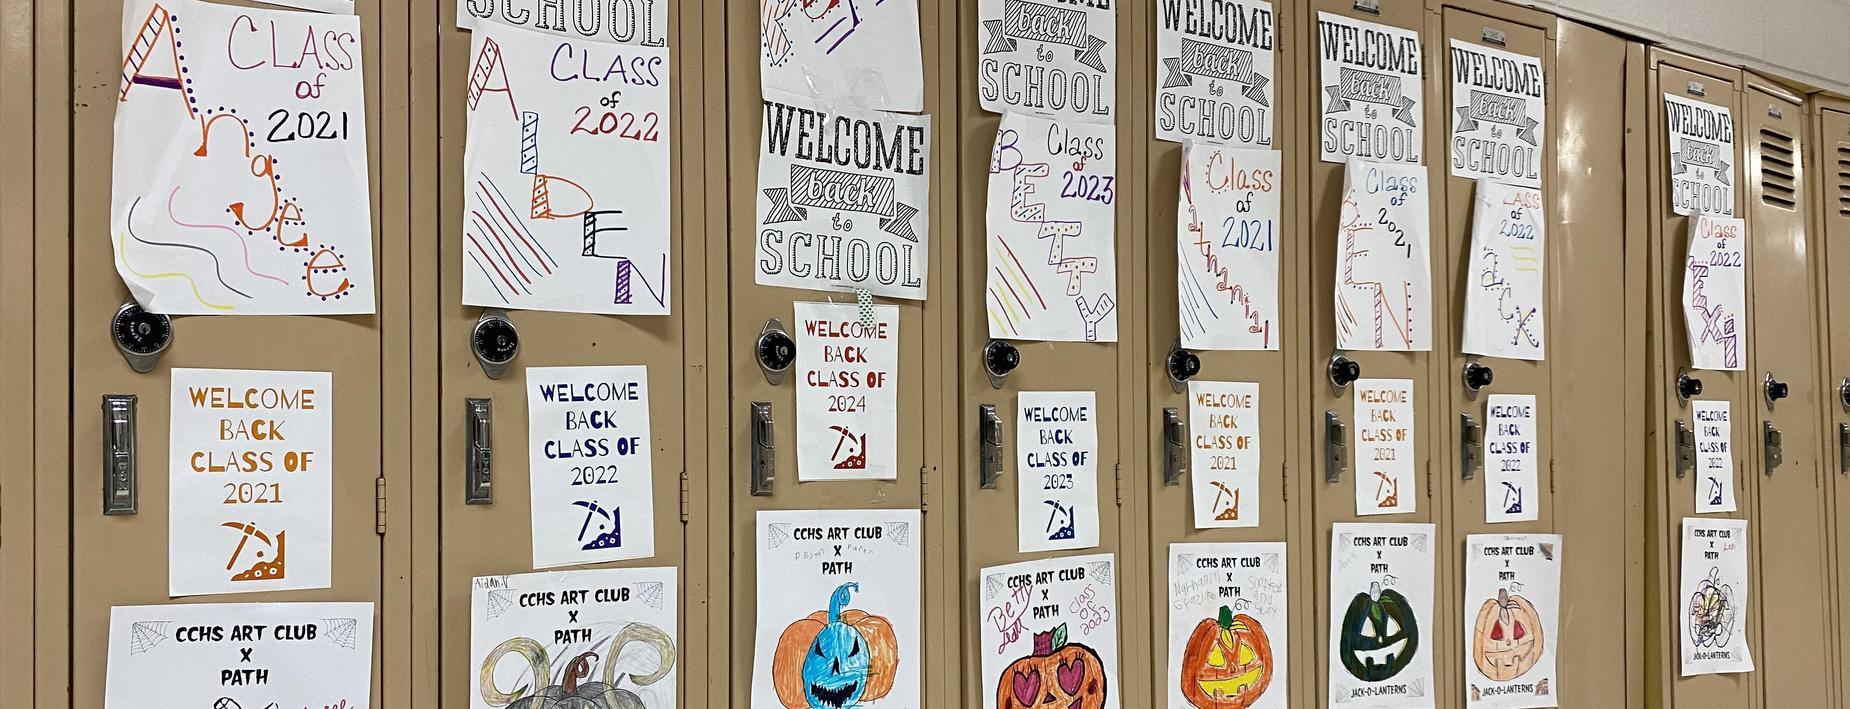 Locker decorating at the high school